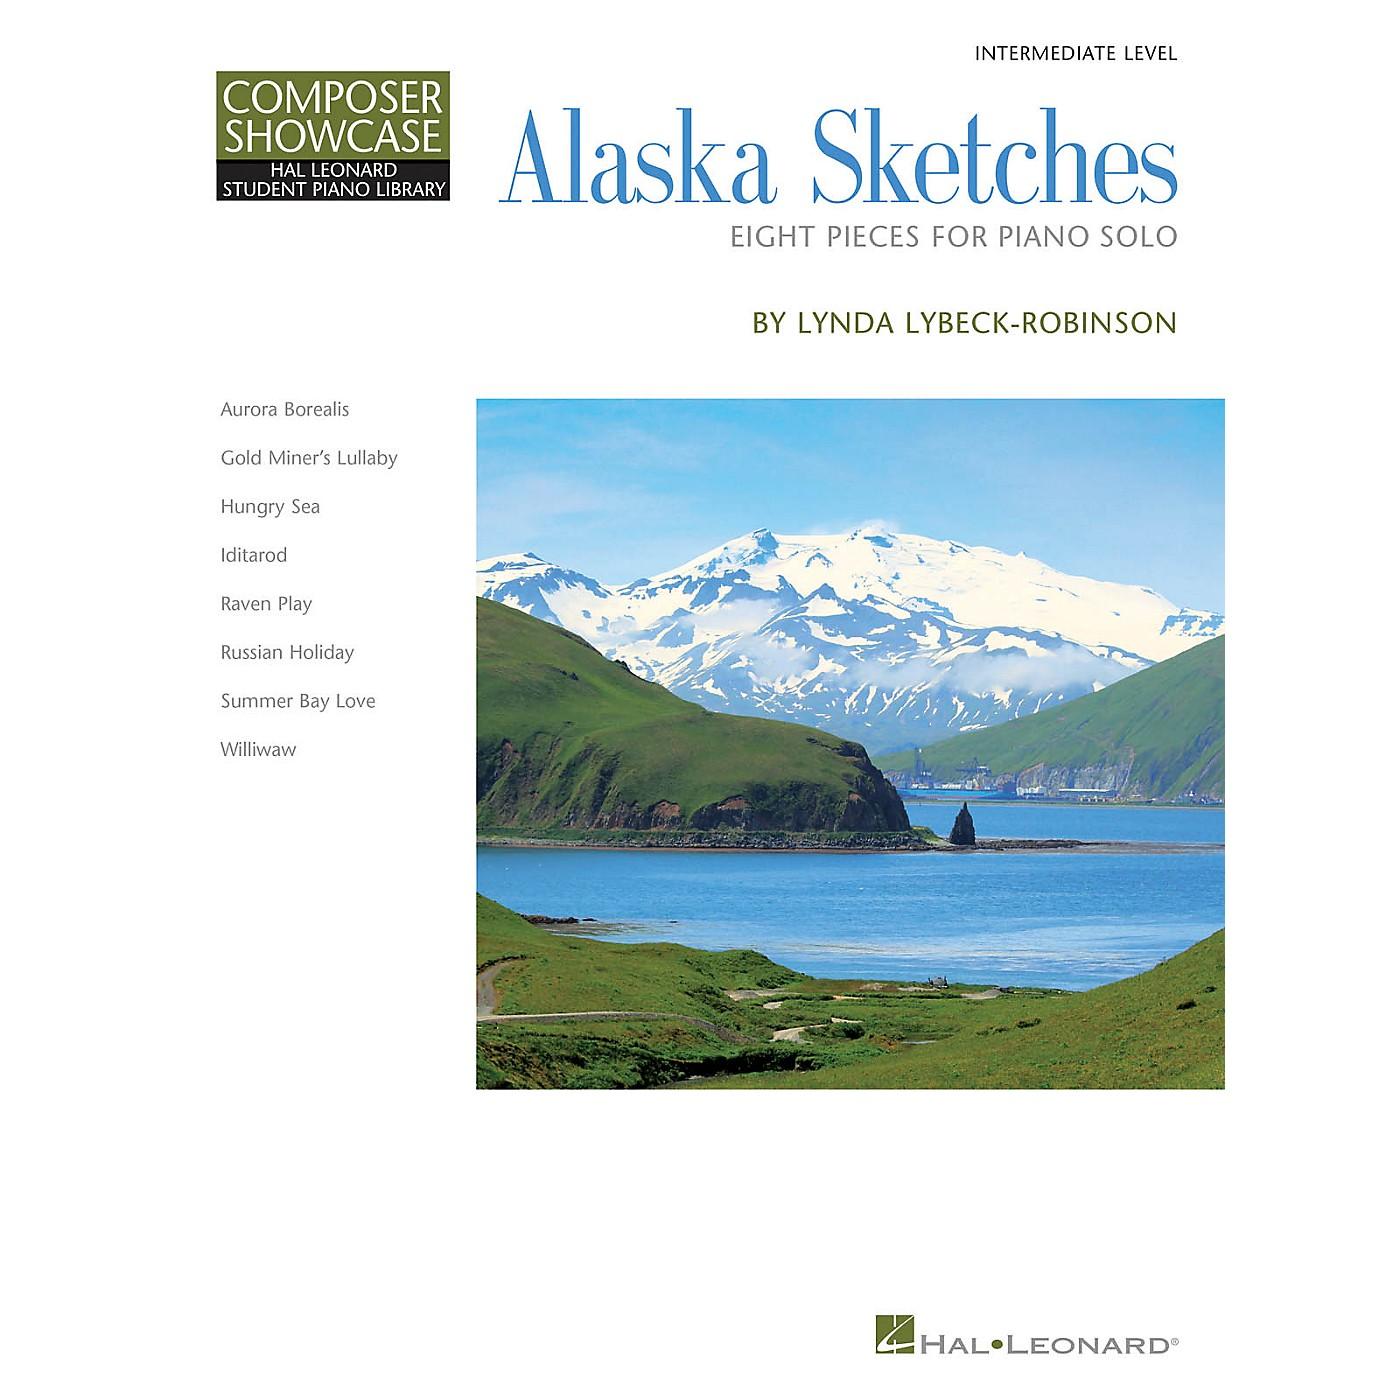 Hal Leonard Alaska Sketches Piano Library Series Book by Lynda Lybeck-Robinson (Level Inter) thumbnail